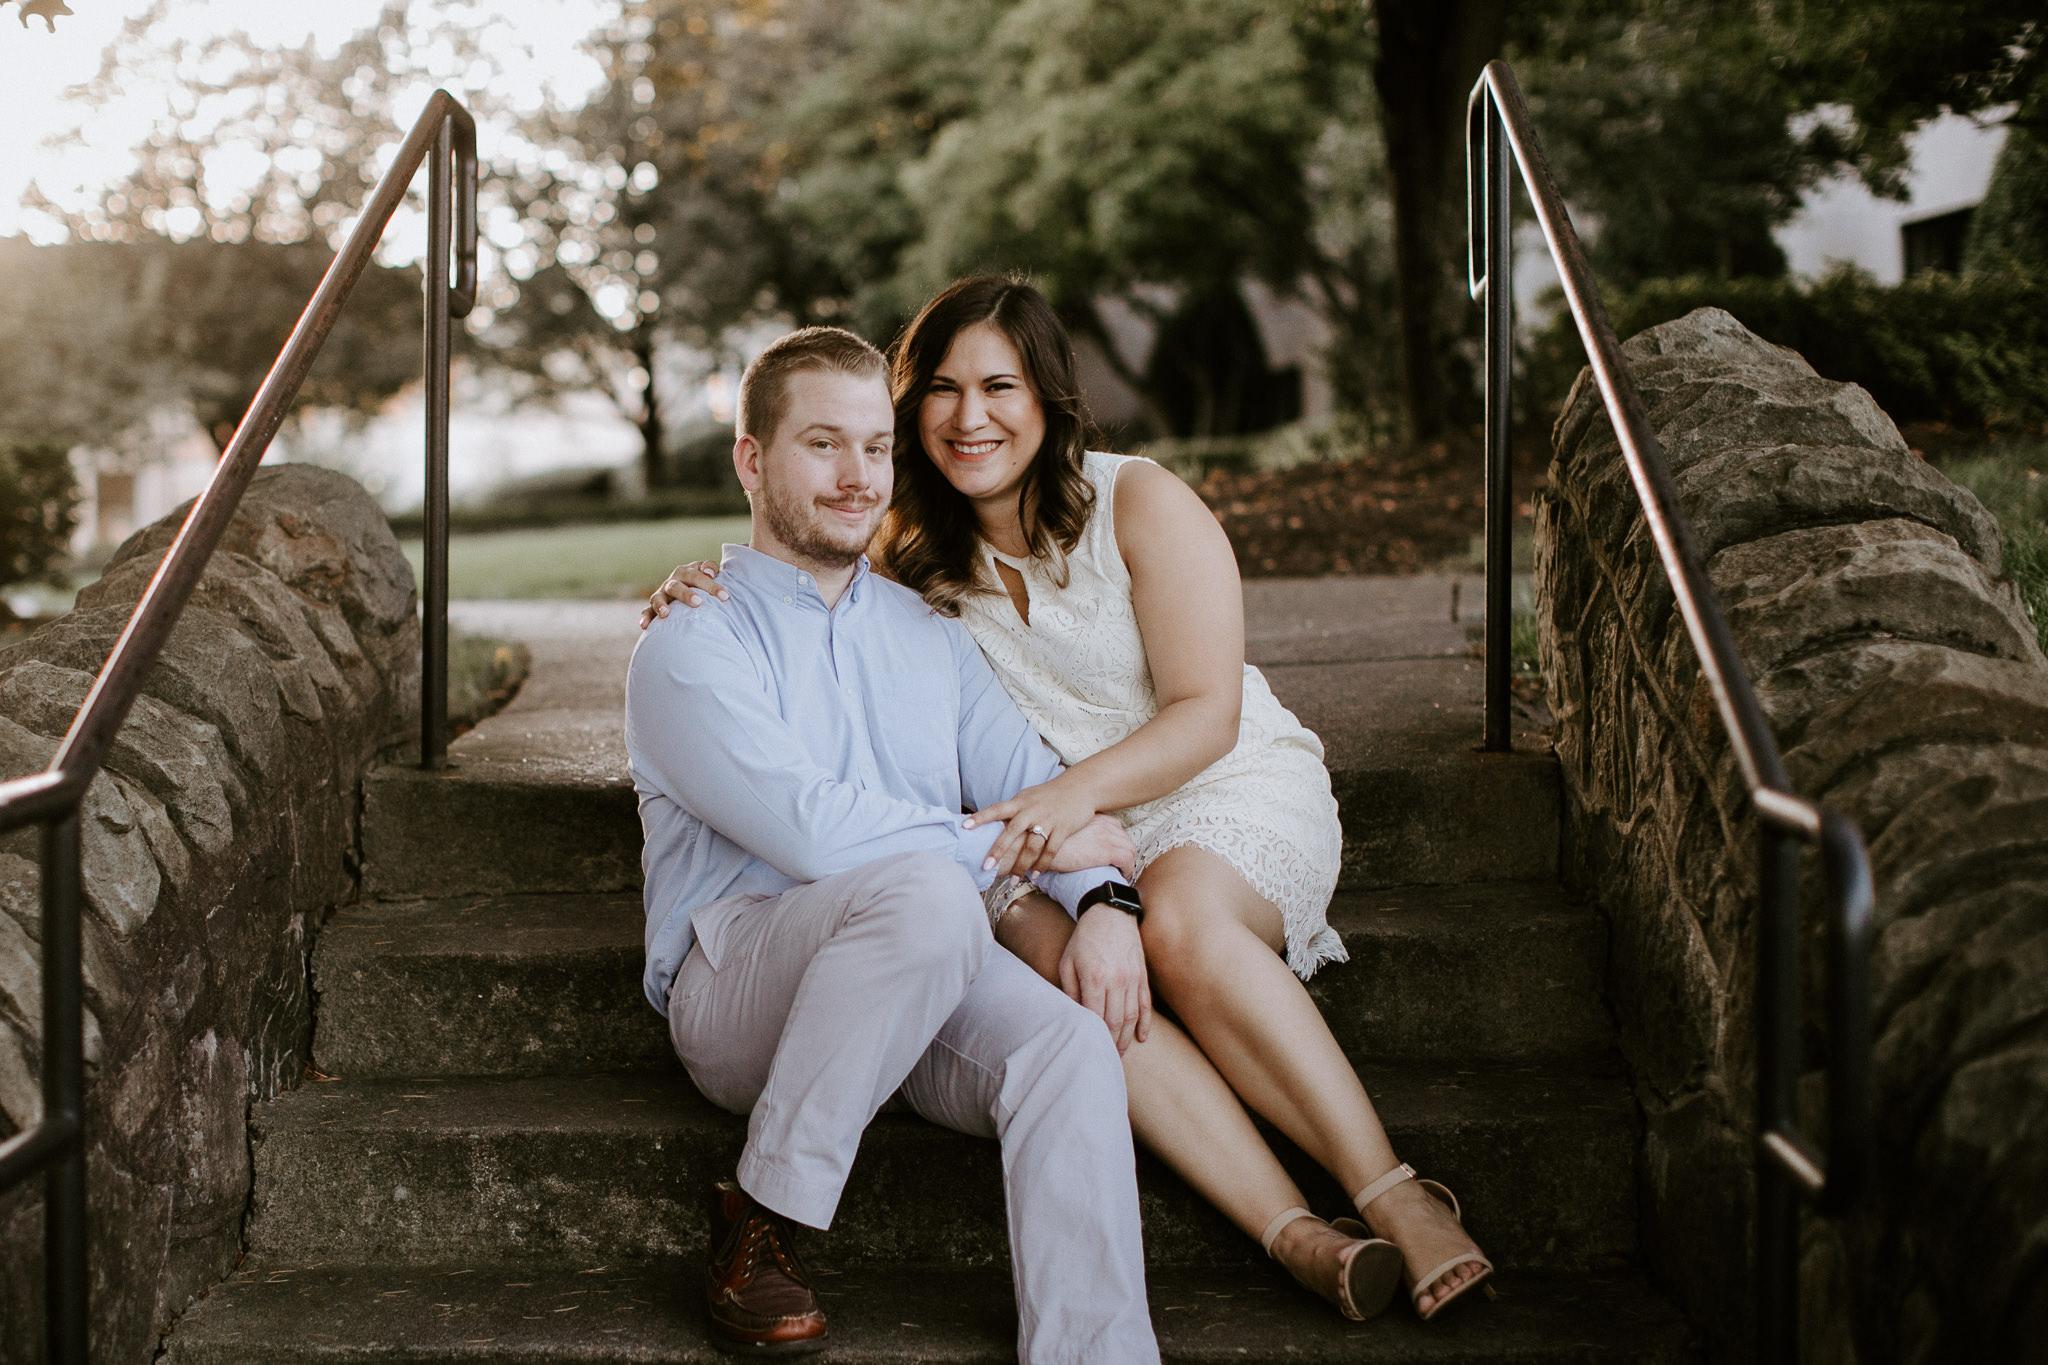 Engagement - Downtown Roanoke -  Wedding Photographer - Virginia - Best - Pat Cori Photography-19.jpg